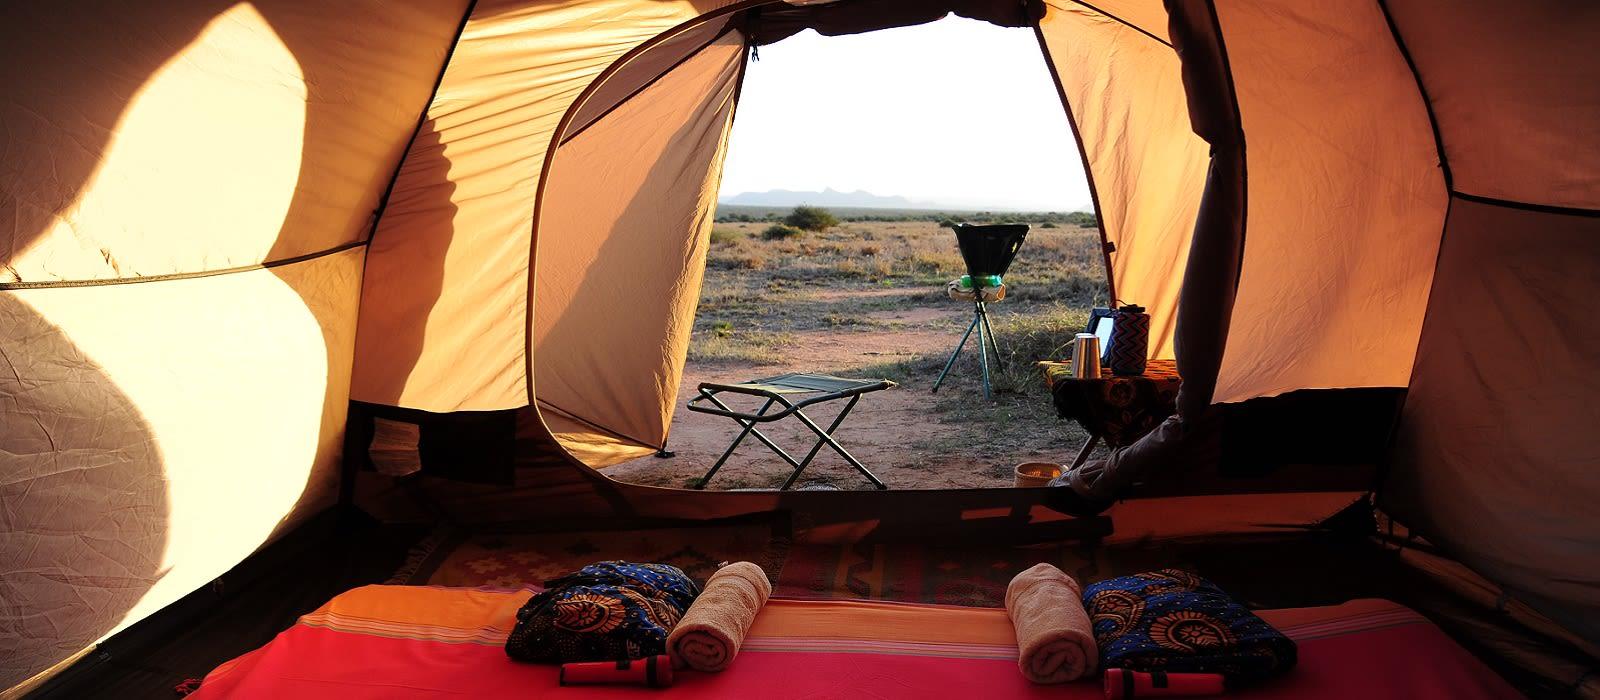 Hotel Karisia Expeditions Bush Camp Kenia